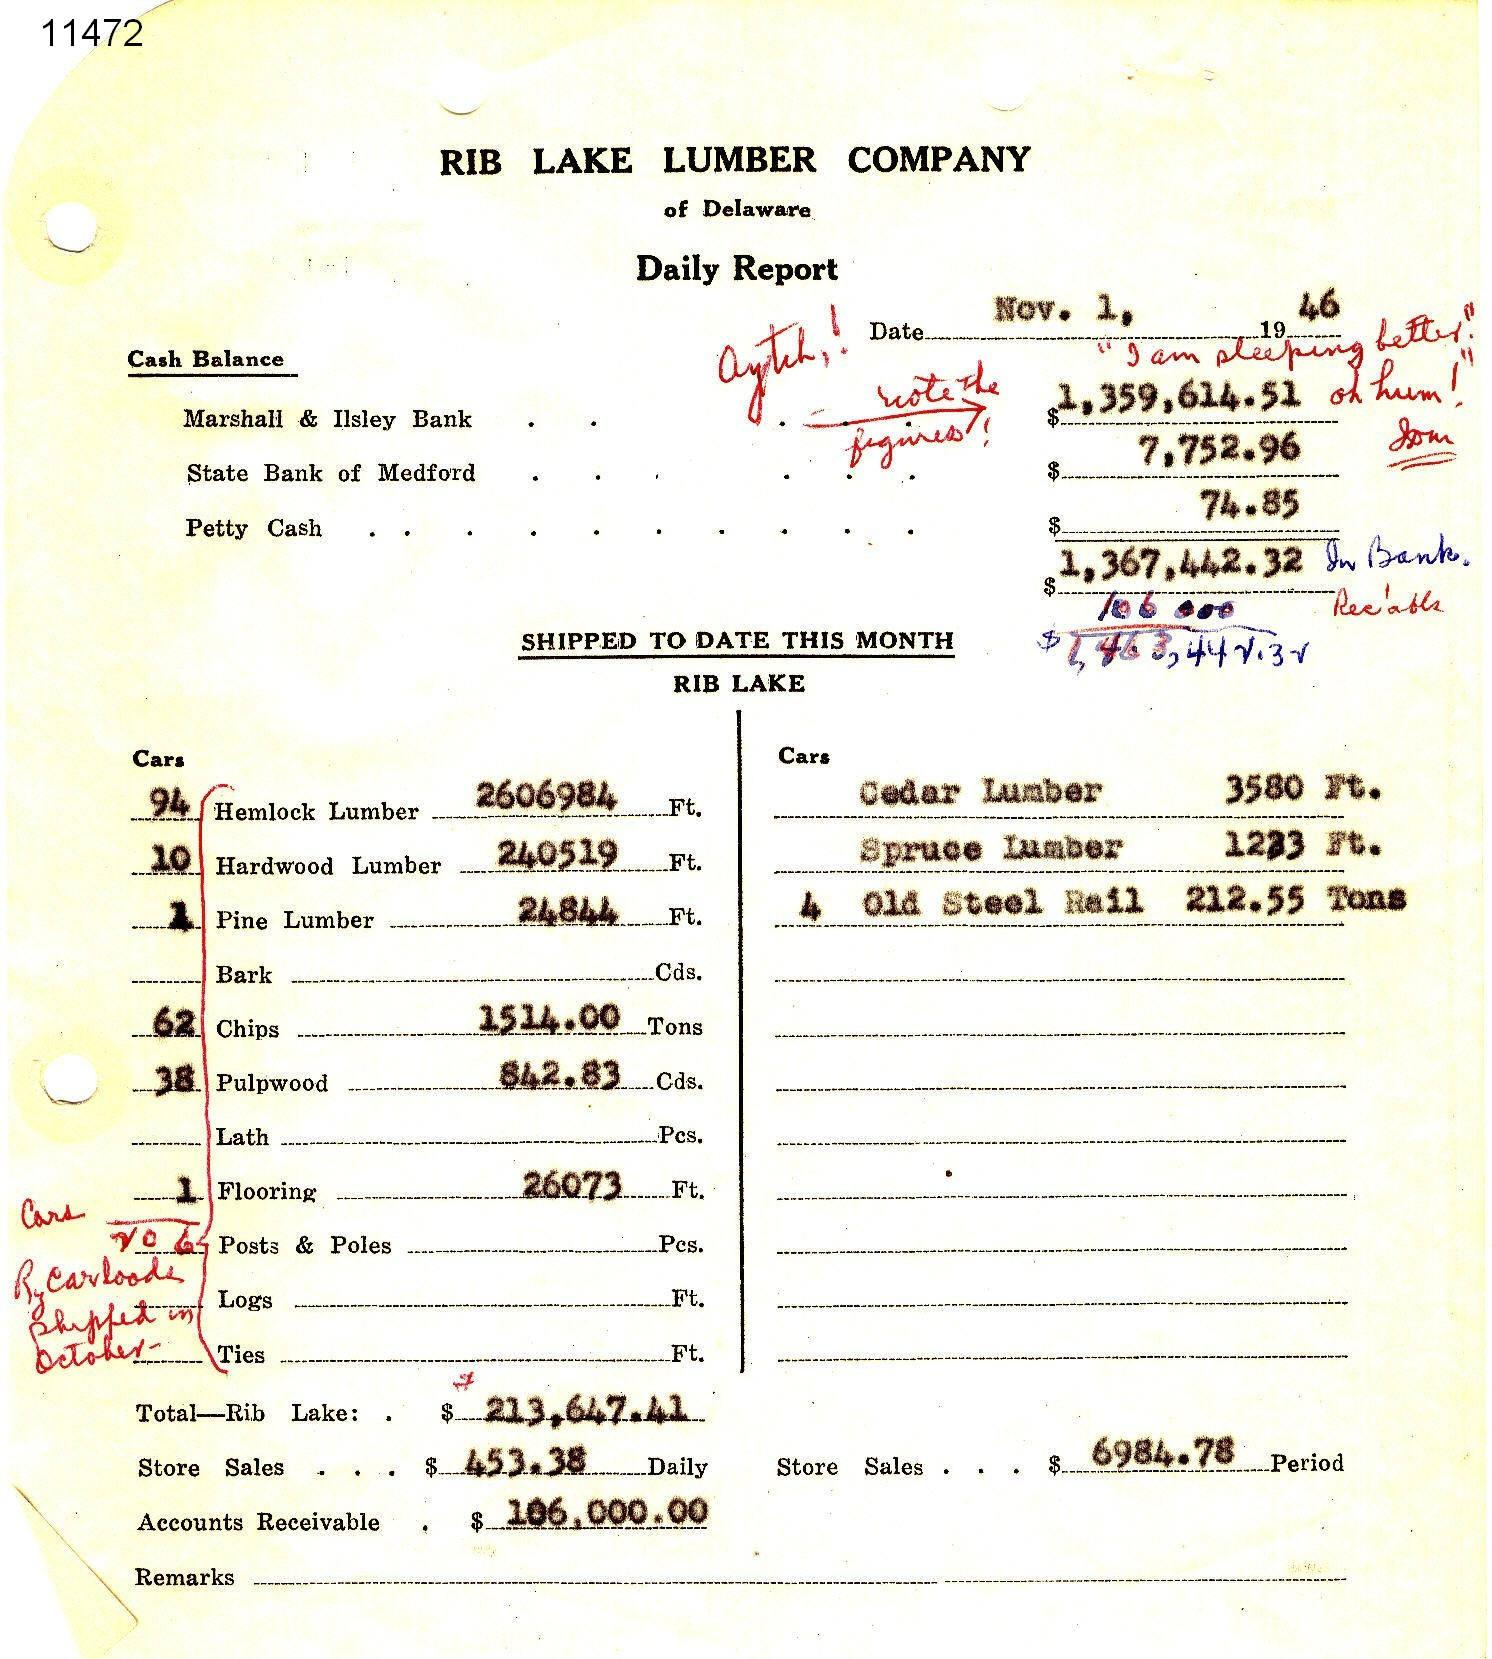 "C:\Users\Robert P. Rusch\Desktop\II. RLHSoc\Documents & Photos-Scanned\Rib Lake History 11400-11499\11472-RLLC 11-1-1946 ""Daily Report"" $1,359,614.51 in bank ""I am sleeping better""-says John D. Myl.jpg"